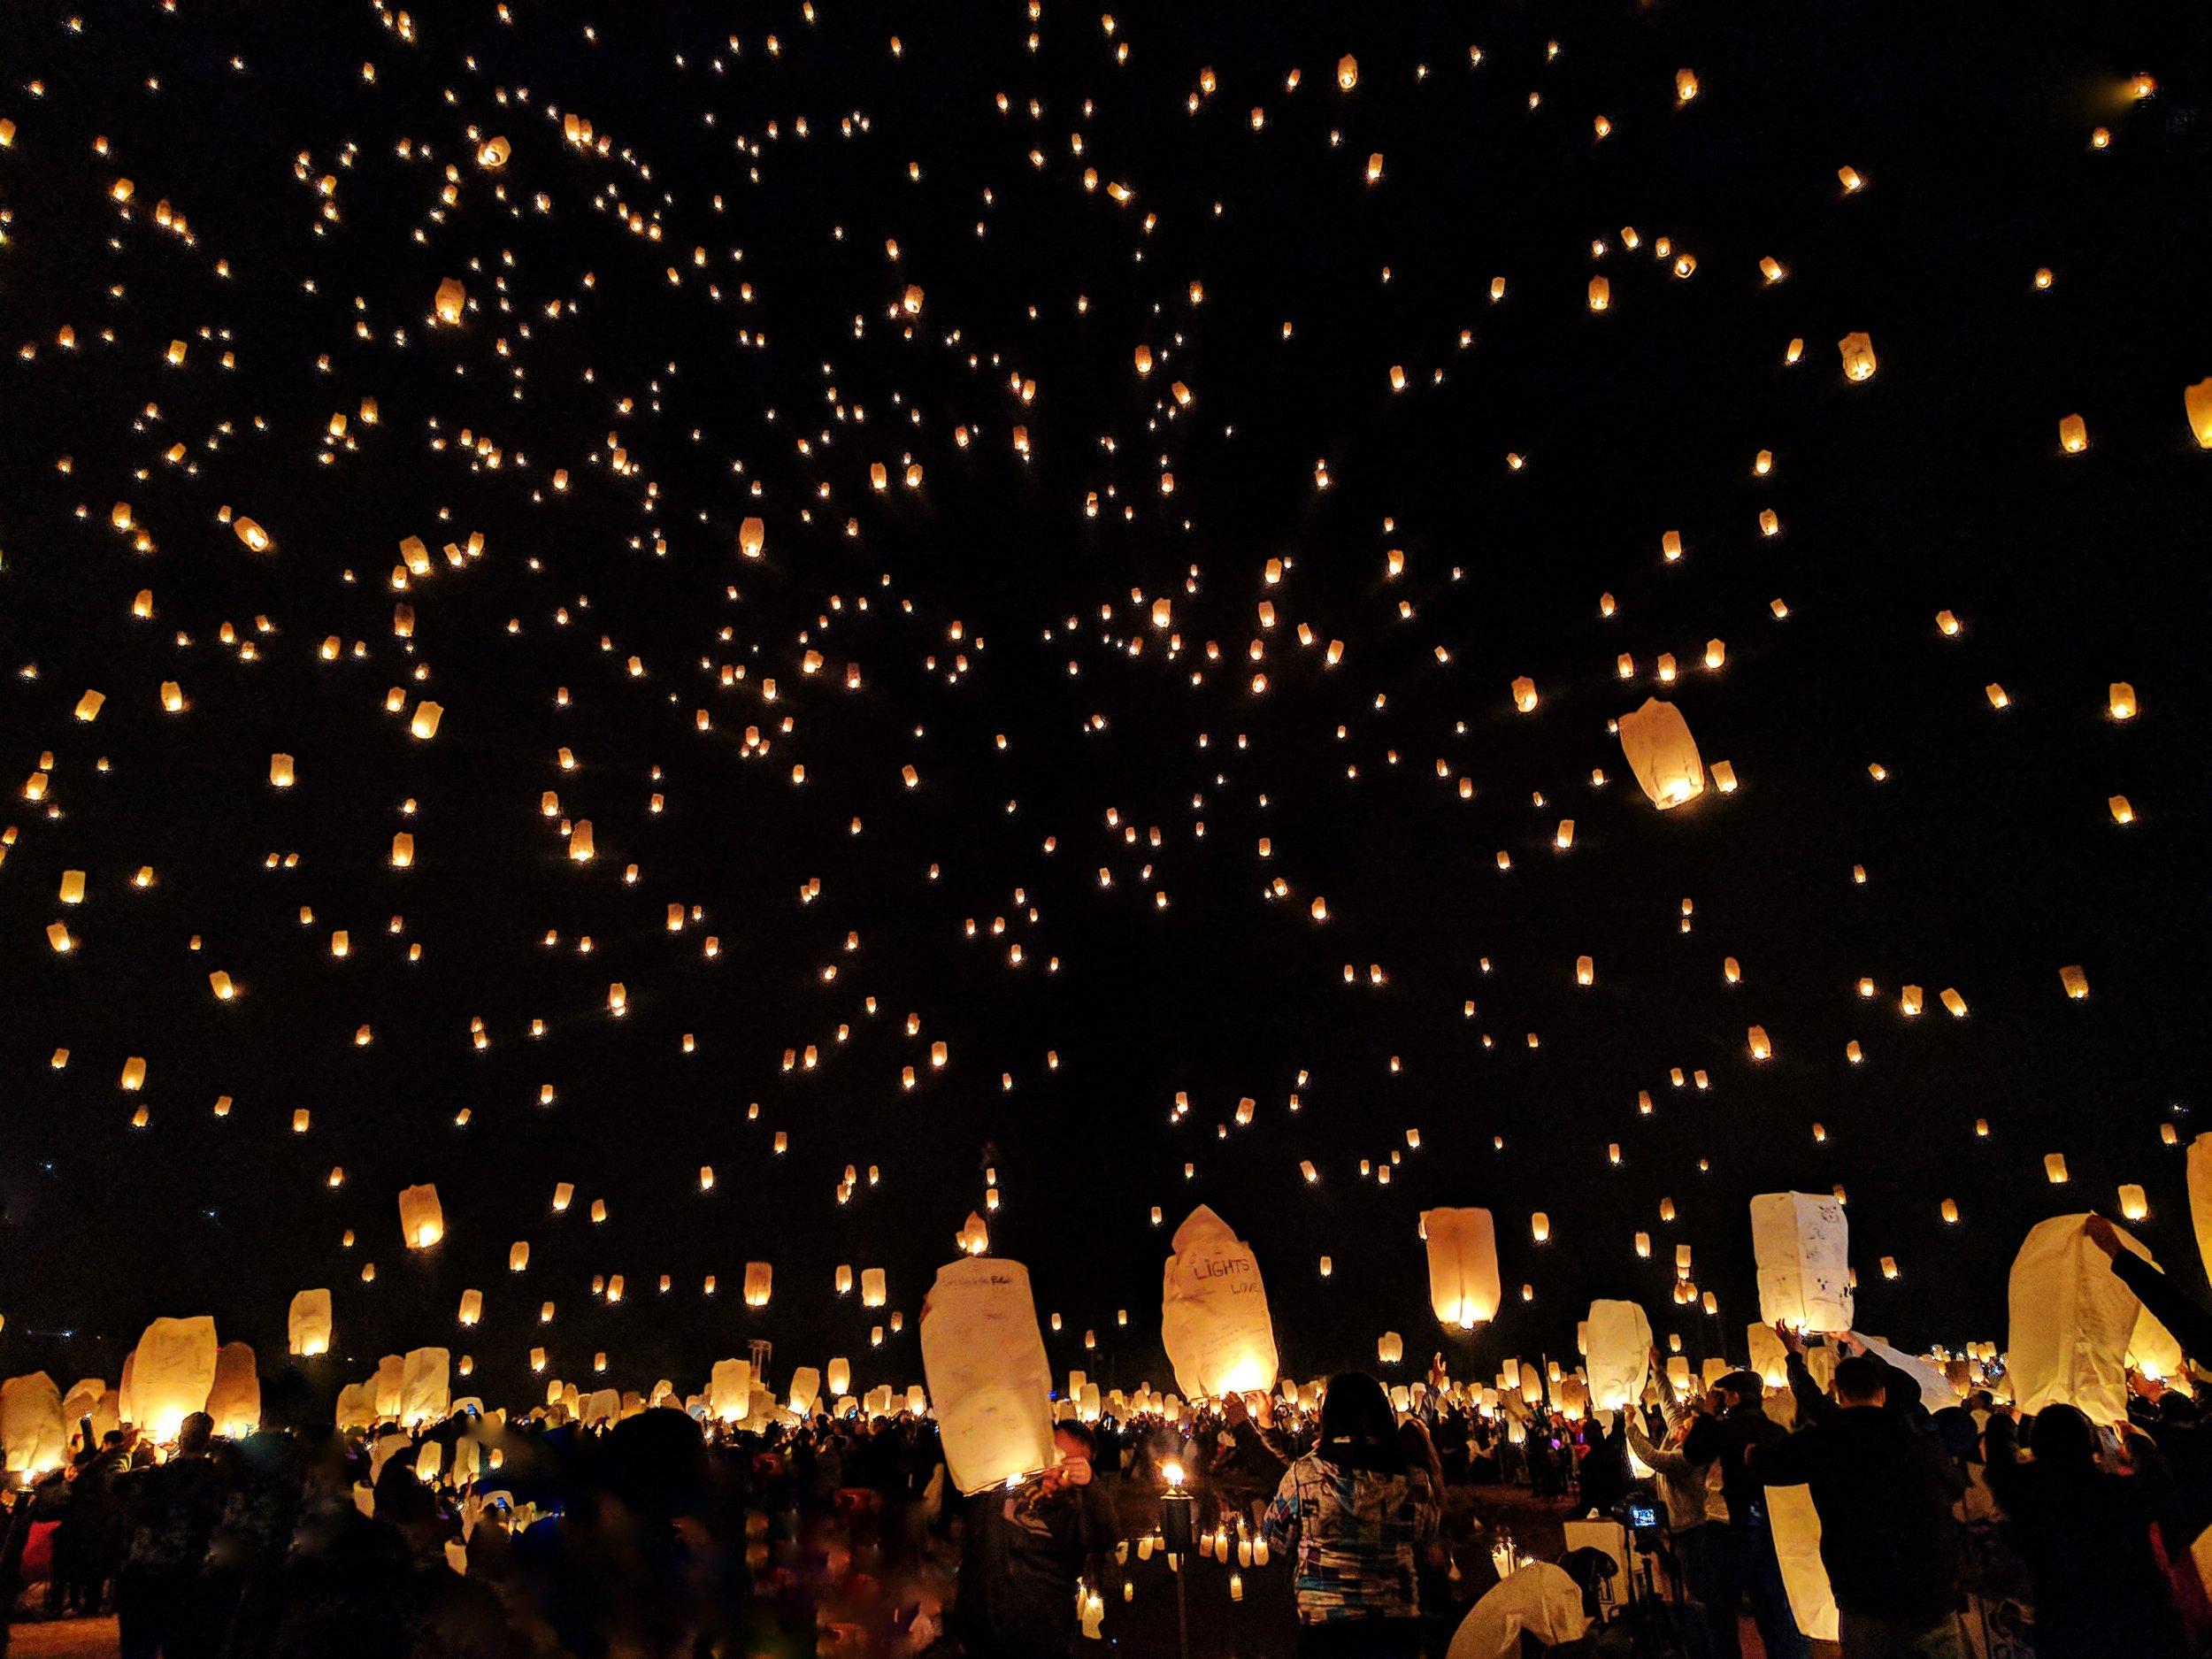 bright-celebration-crowd-431722.jpg